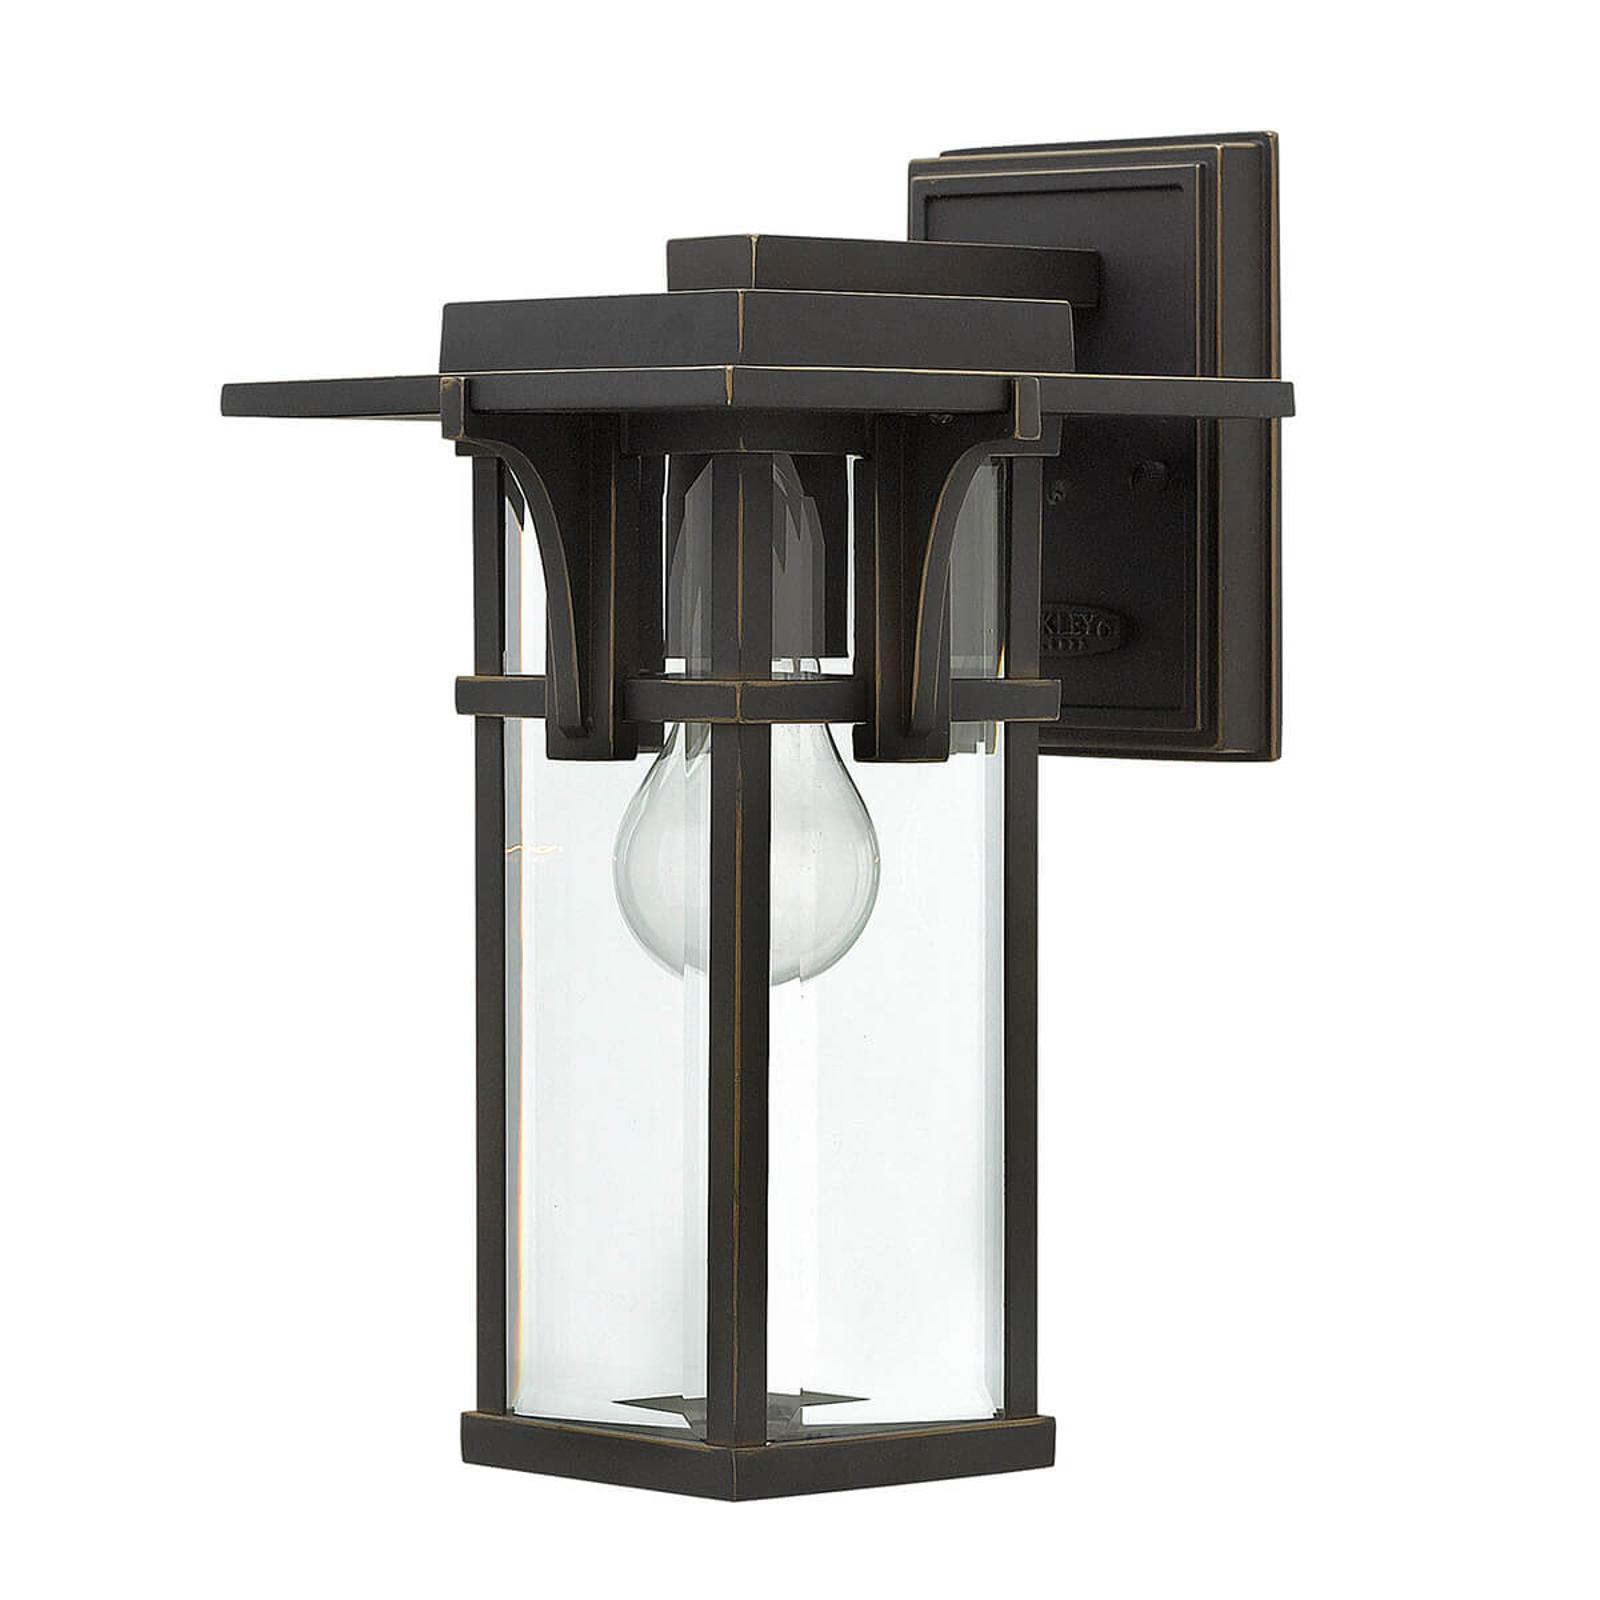 Manhattan - buitenwandlamp in industriële stijl